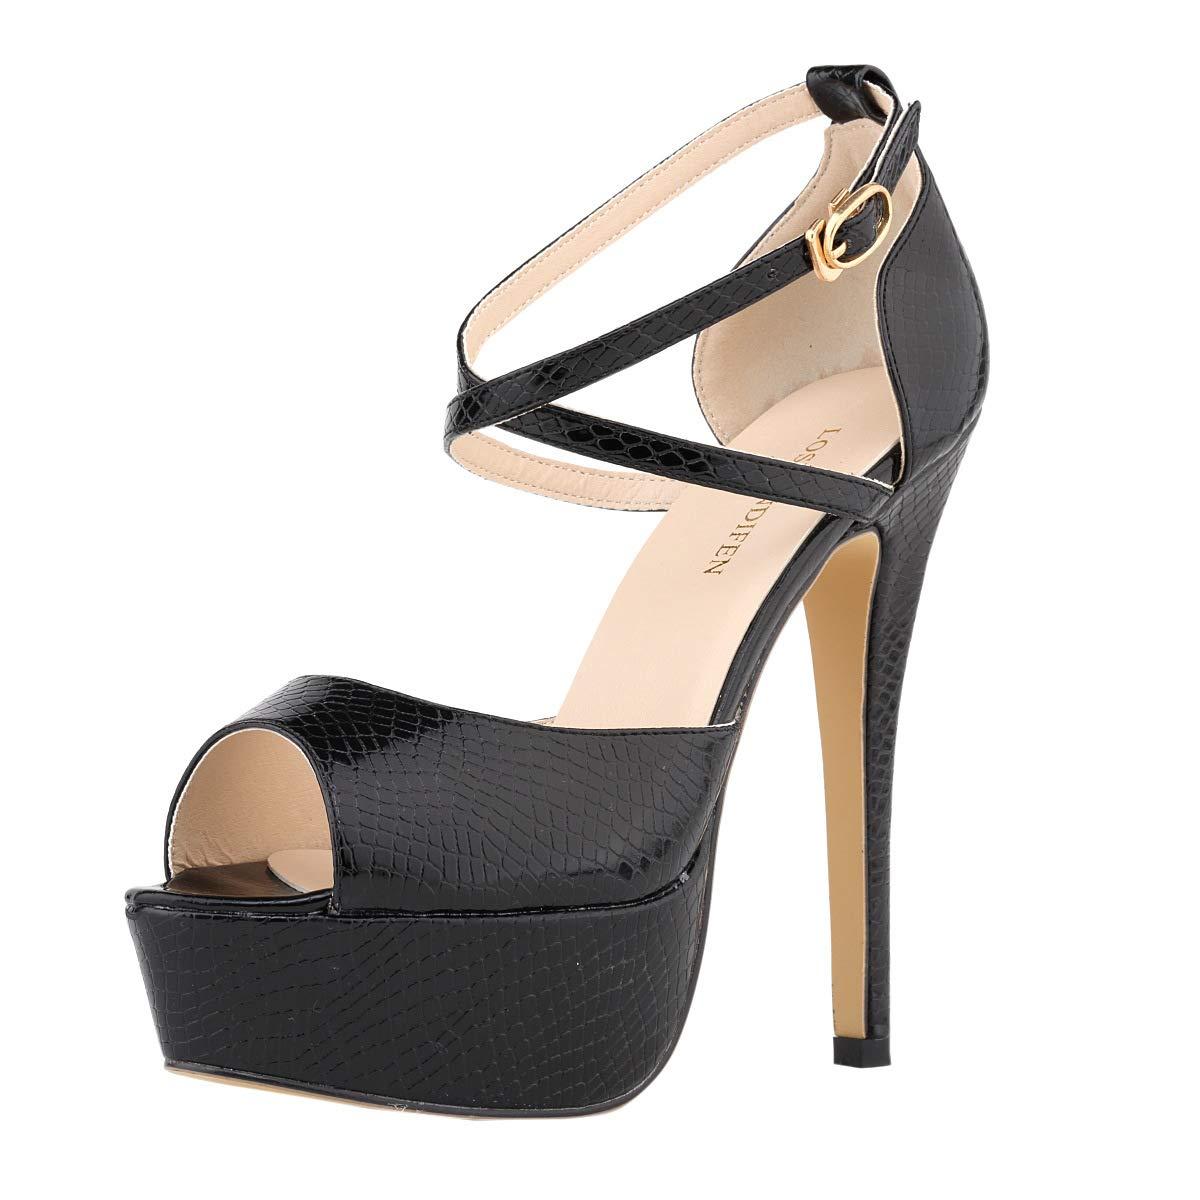 Black Women's Peep Toe Platform Stiletto High Heel Ankle Crisscross Strap Buckle Snap Dress Party Heeled Sandals